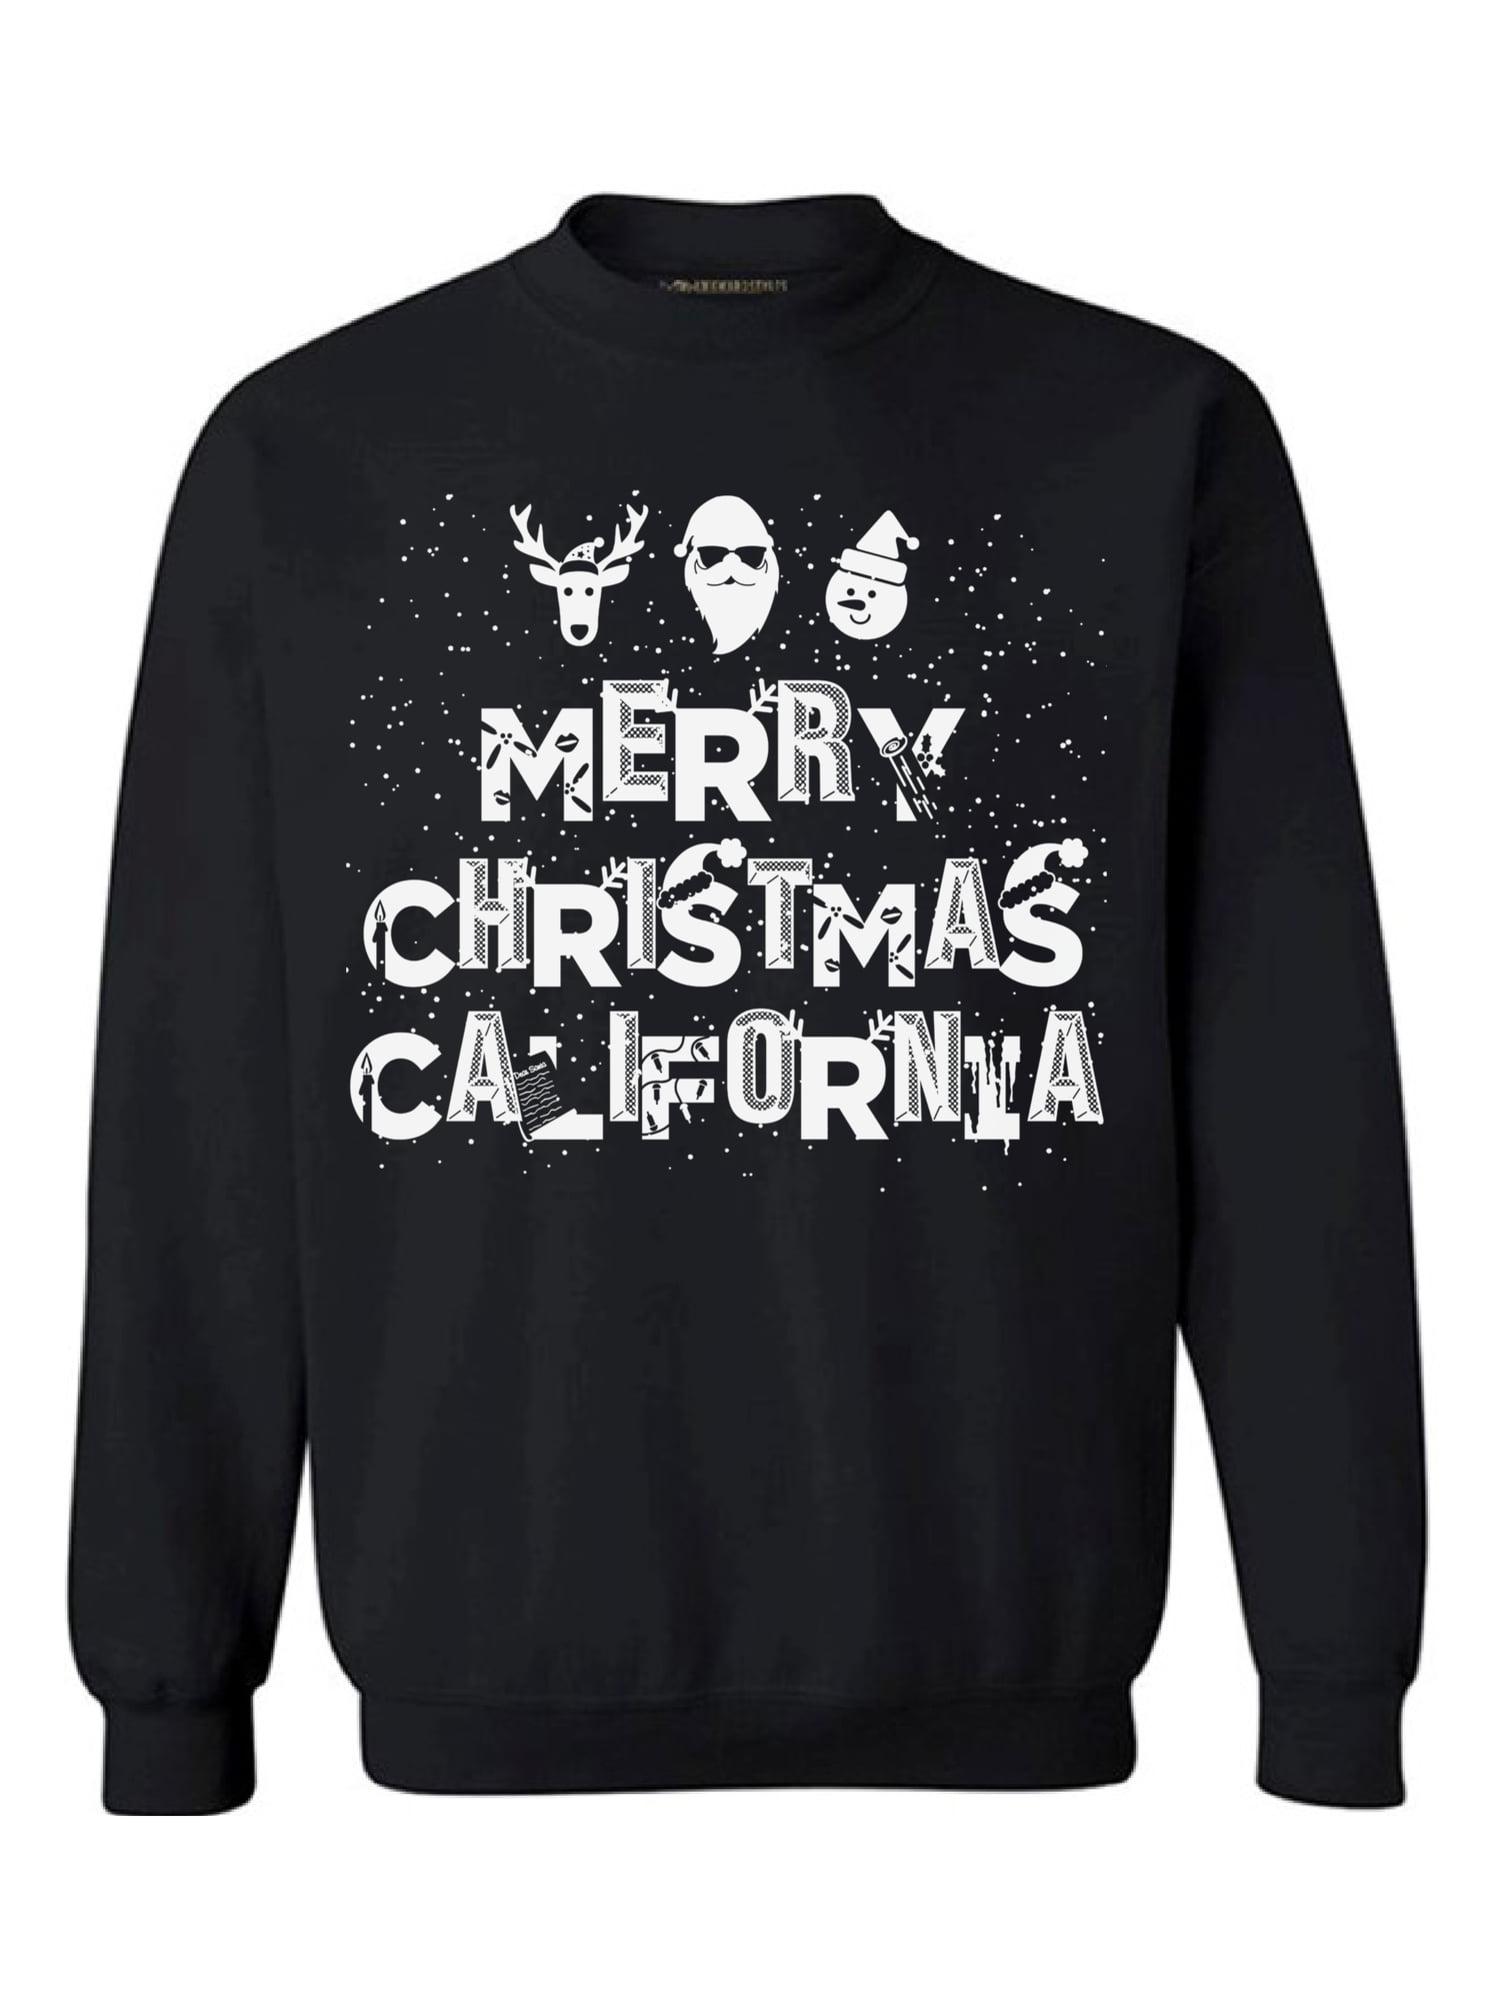 Awkward Styles Merry Christmas California Sweatshirt Ugly Christmas Sweater Cali Love